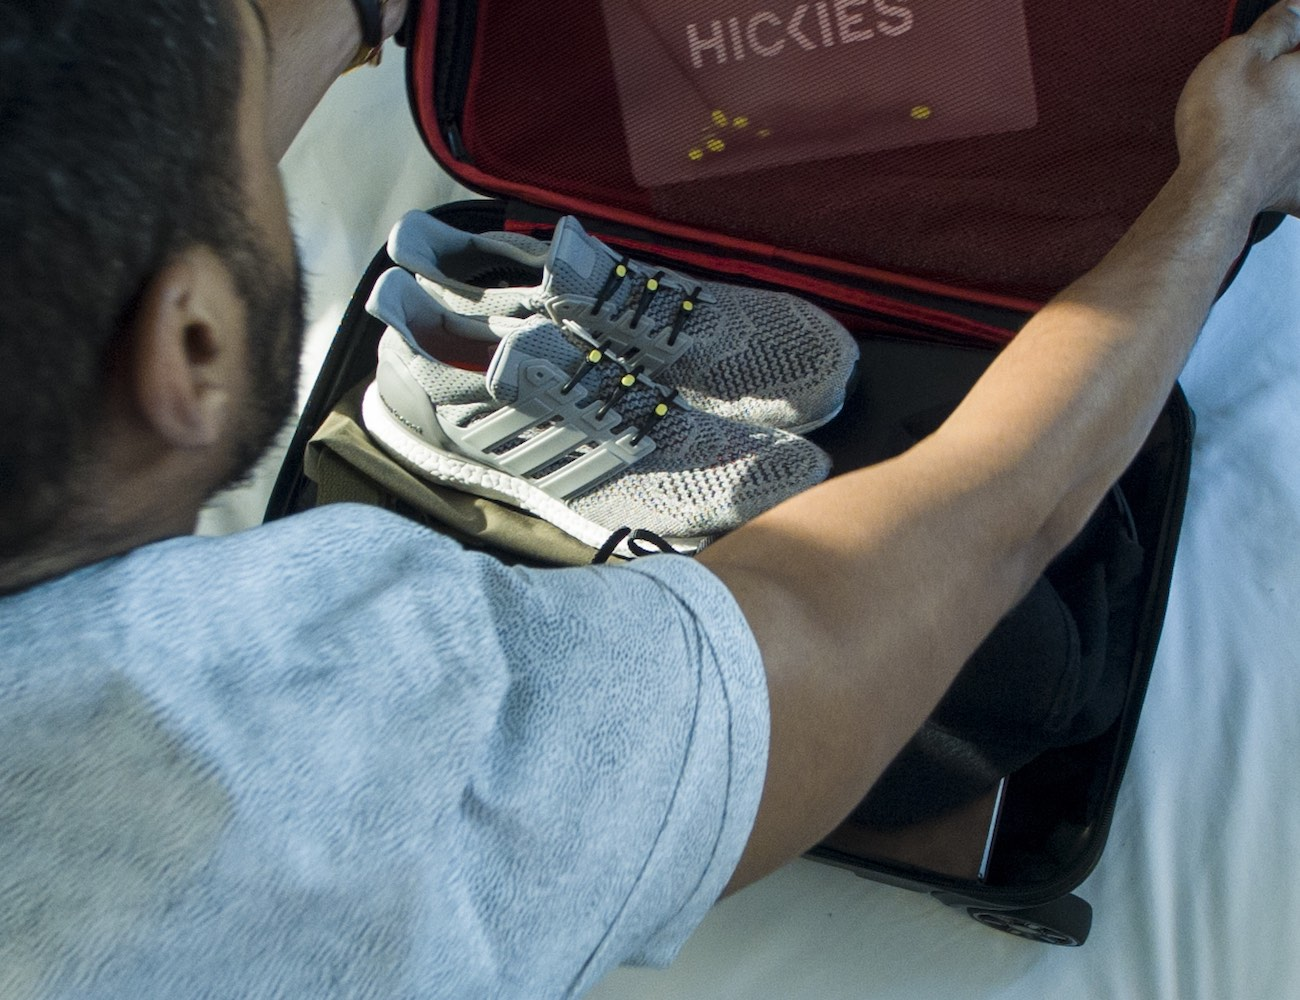 HICKIES 2.0